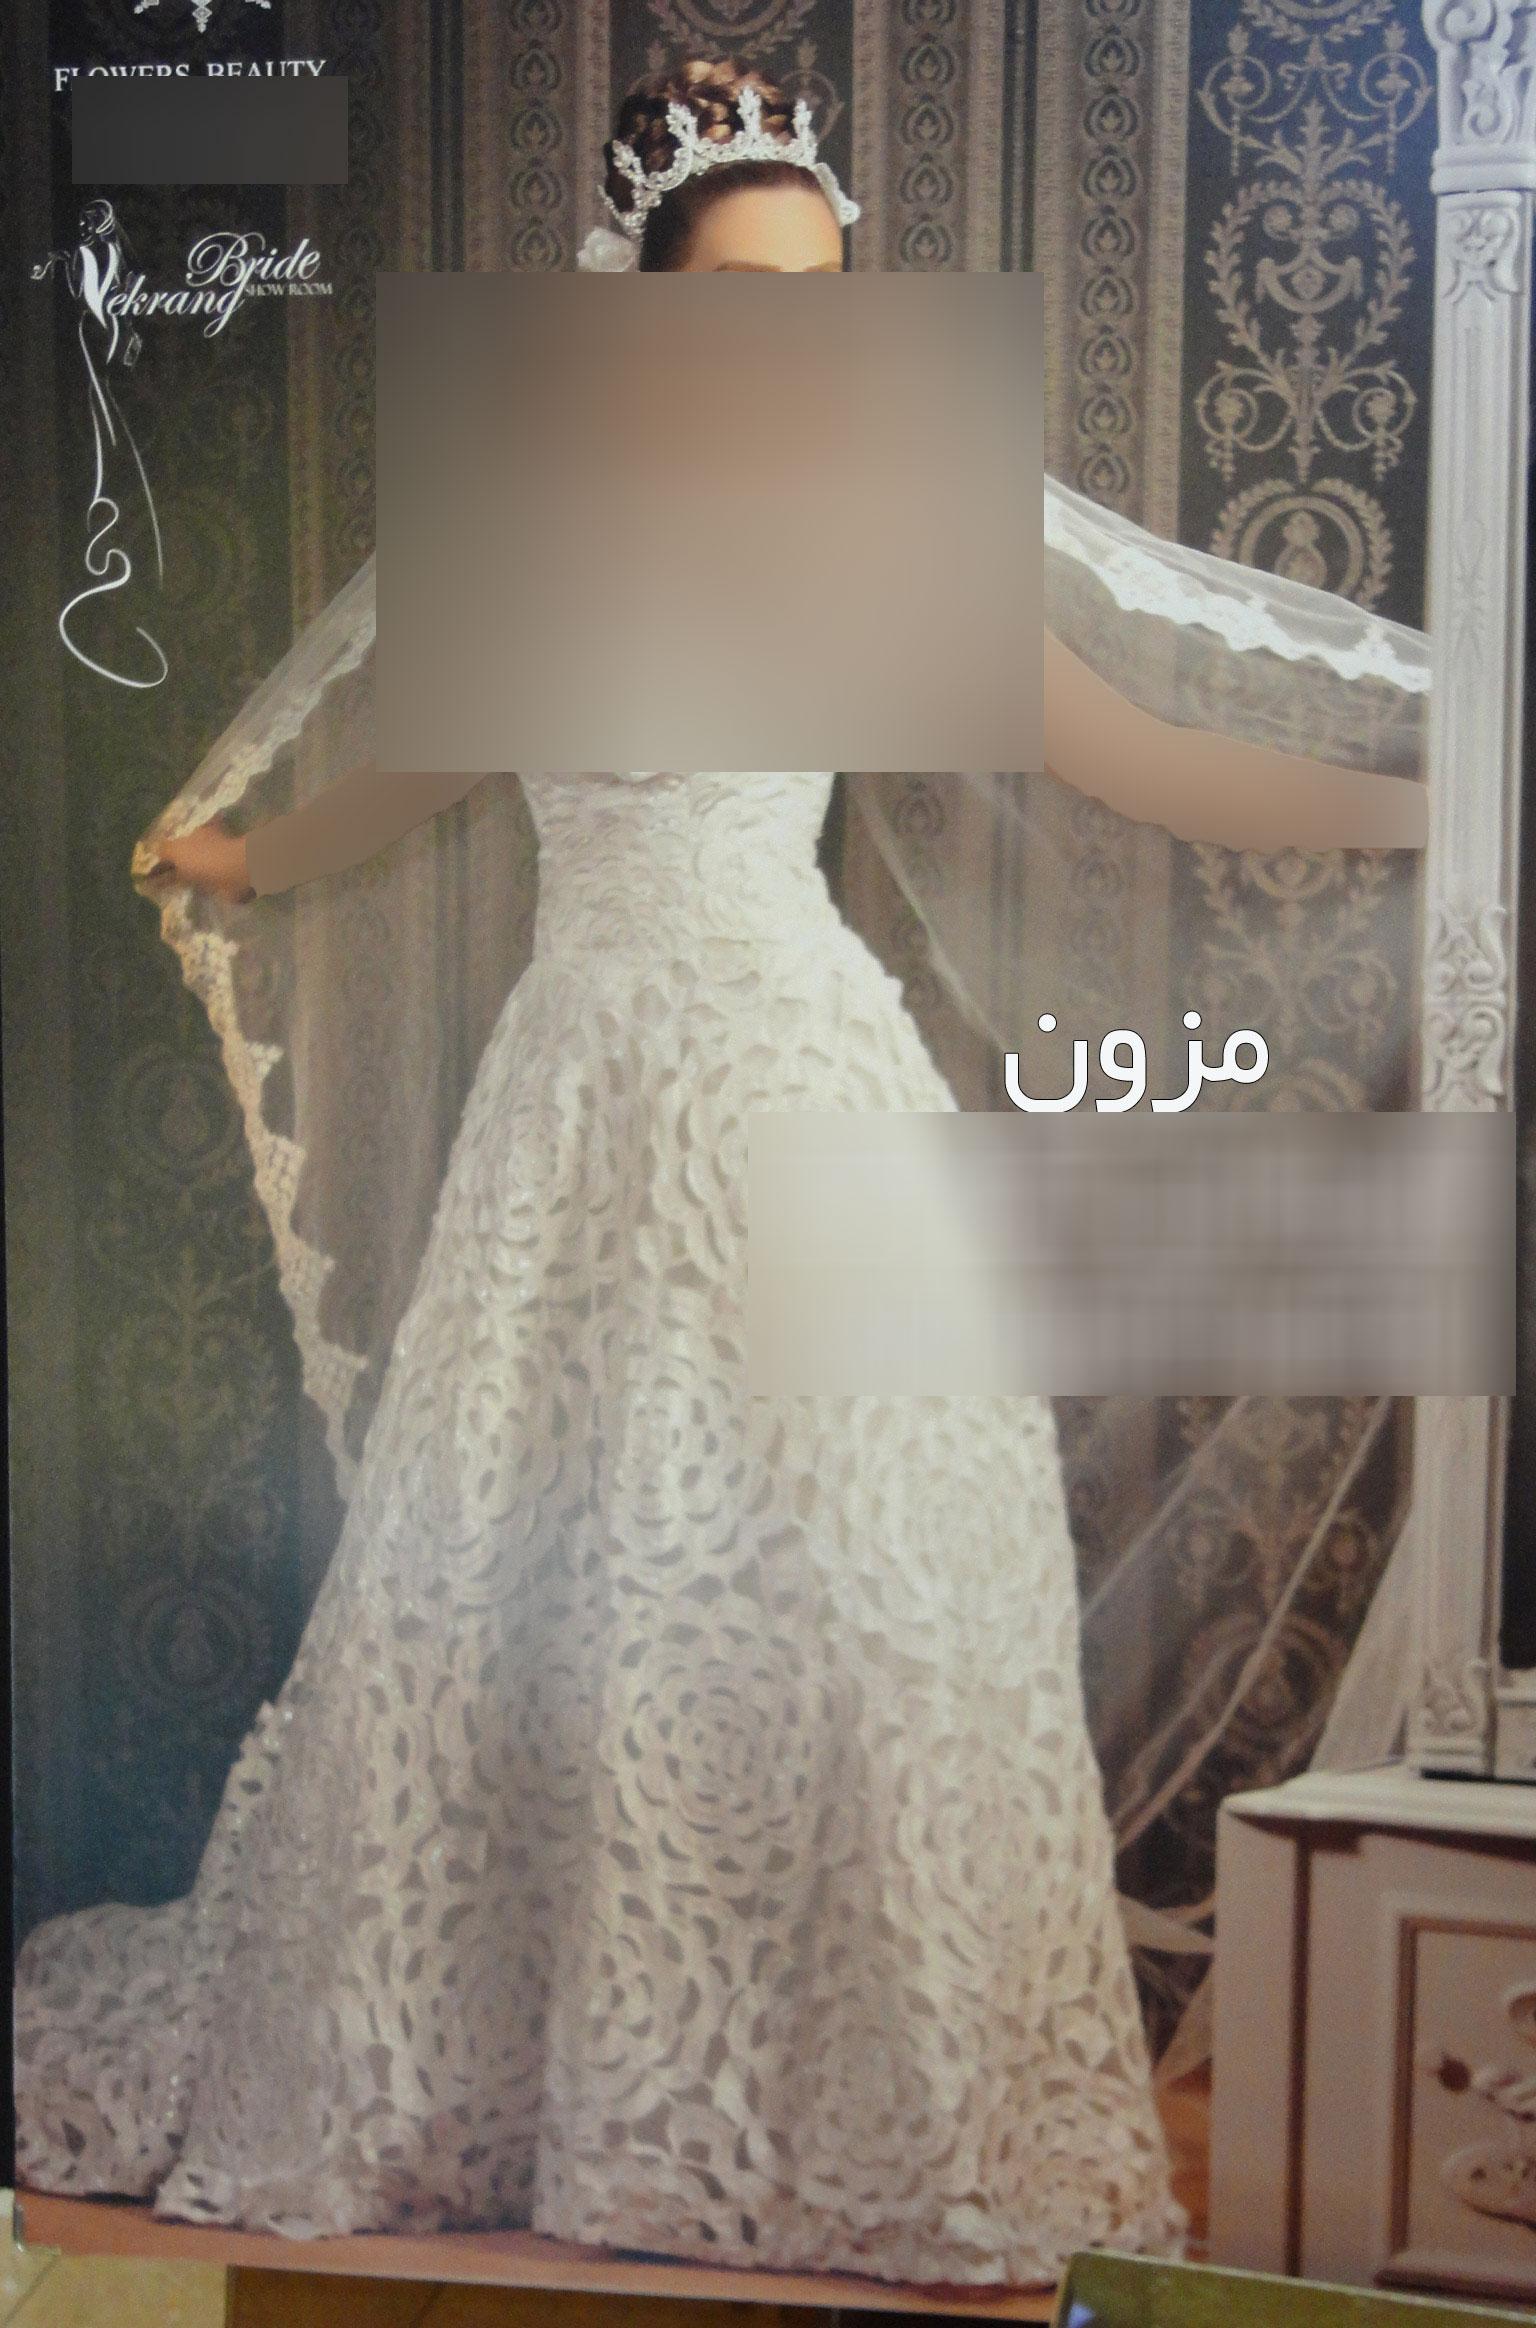 مزون لباس عروس ترکیه در تهران و کرج ,اجاره لباس عروس در کرج و تهران,کرایه لباس عروس در تهران و کرج,بهترین مزون لباس عروس در تهران